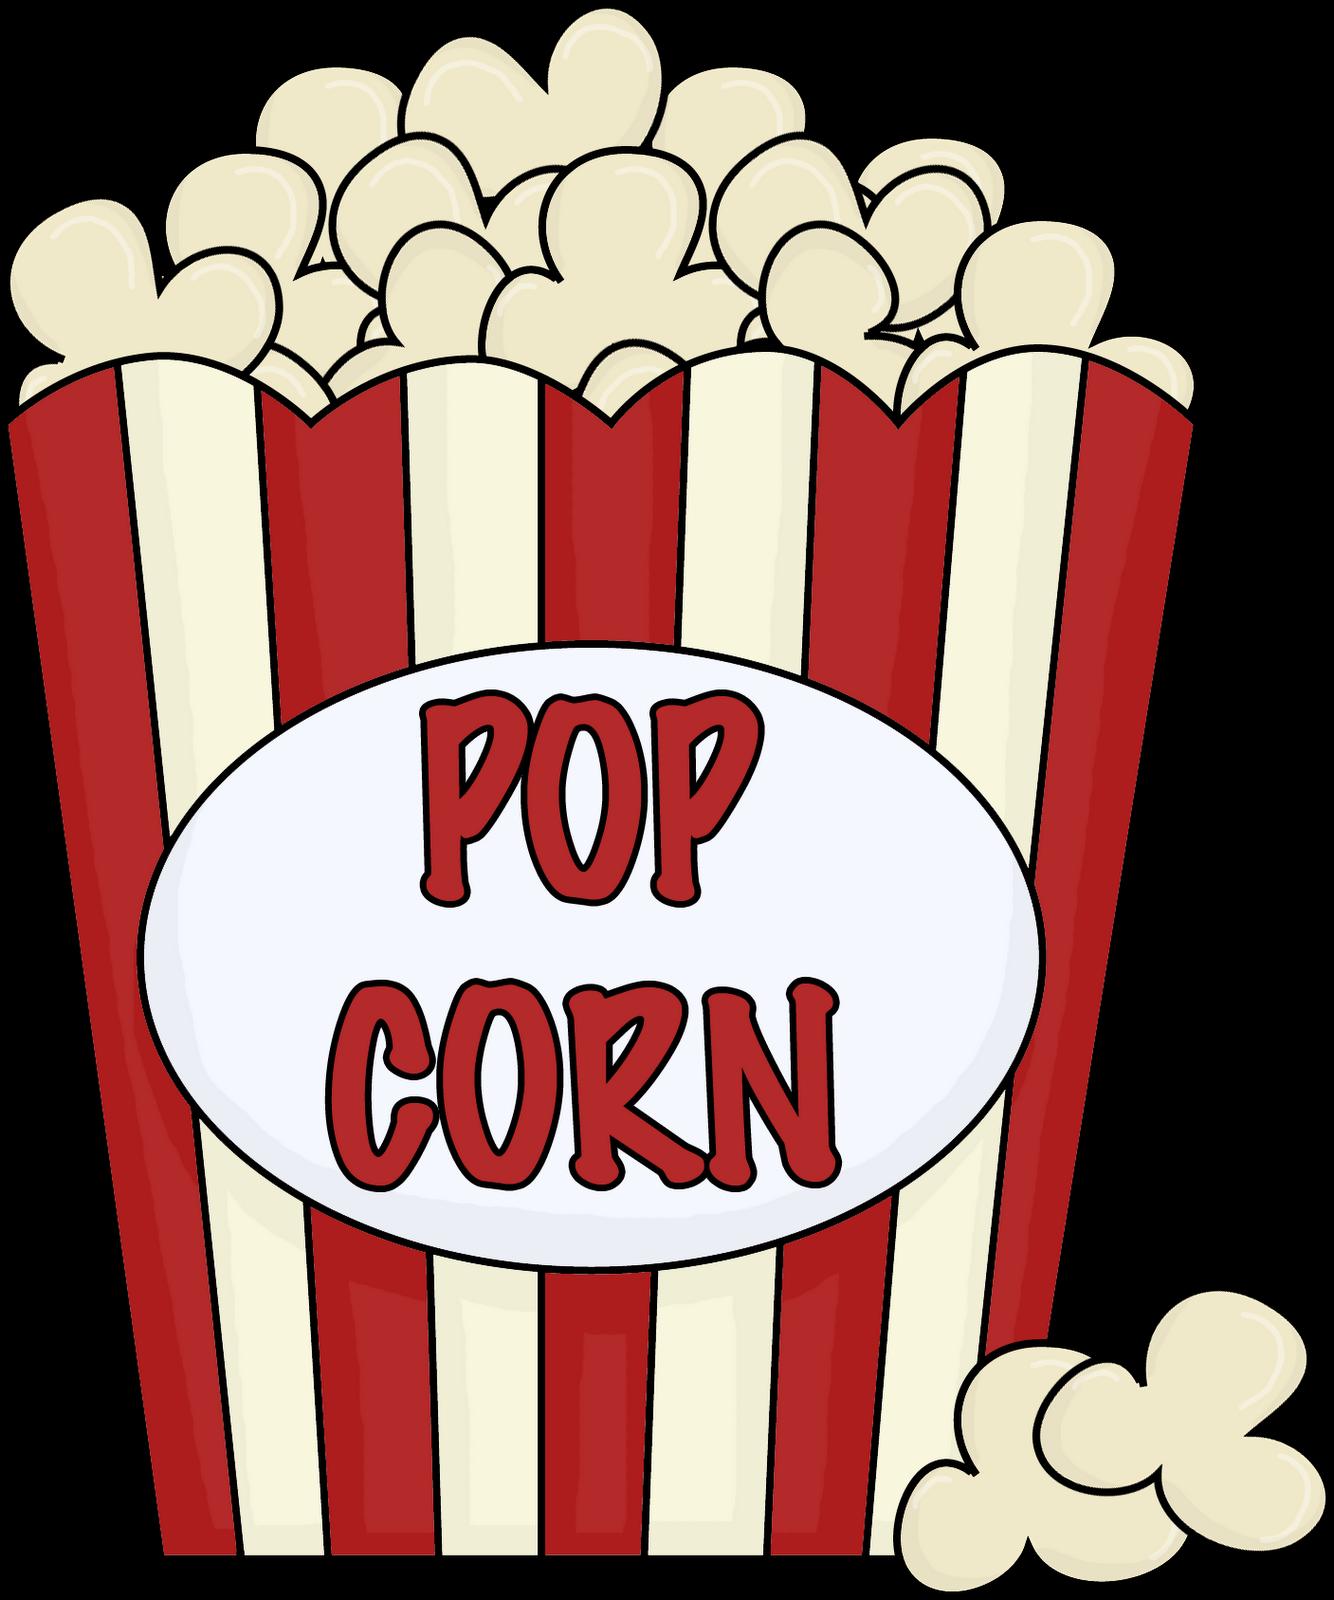 Popcorn Clip Art Black And White Outline-Popcorn clip art black and white outline free-11